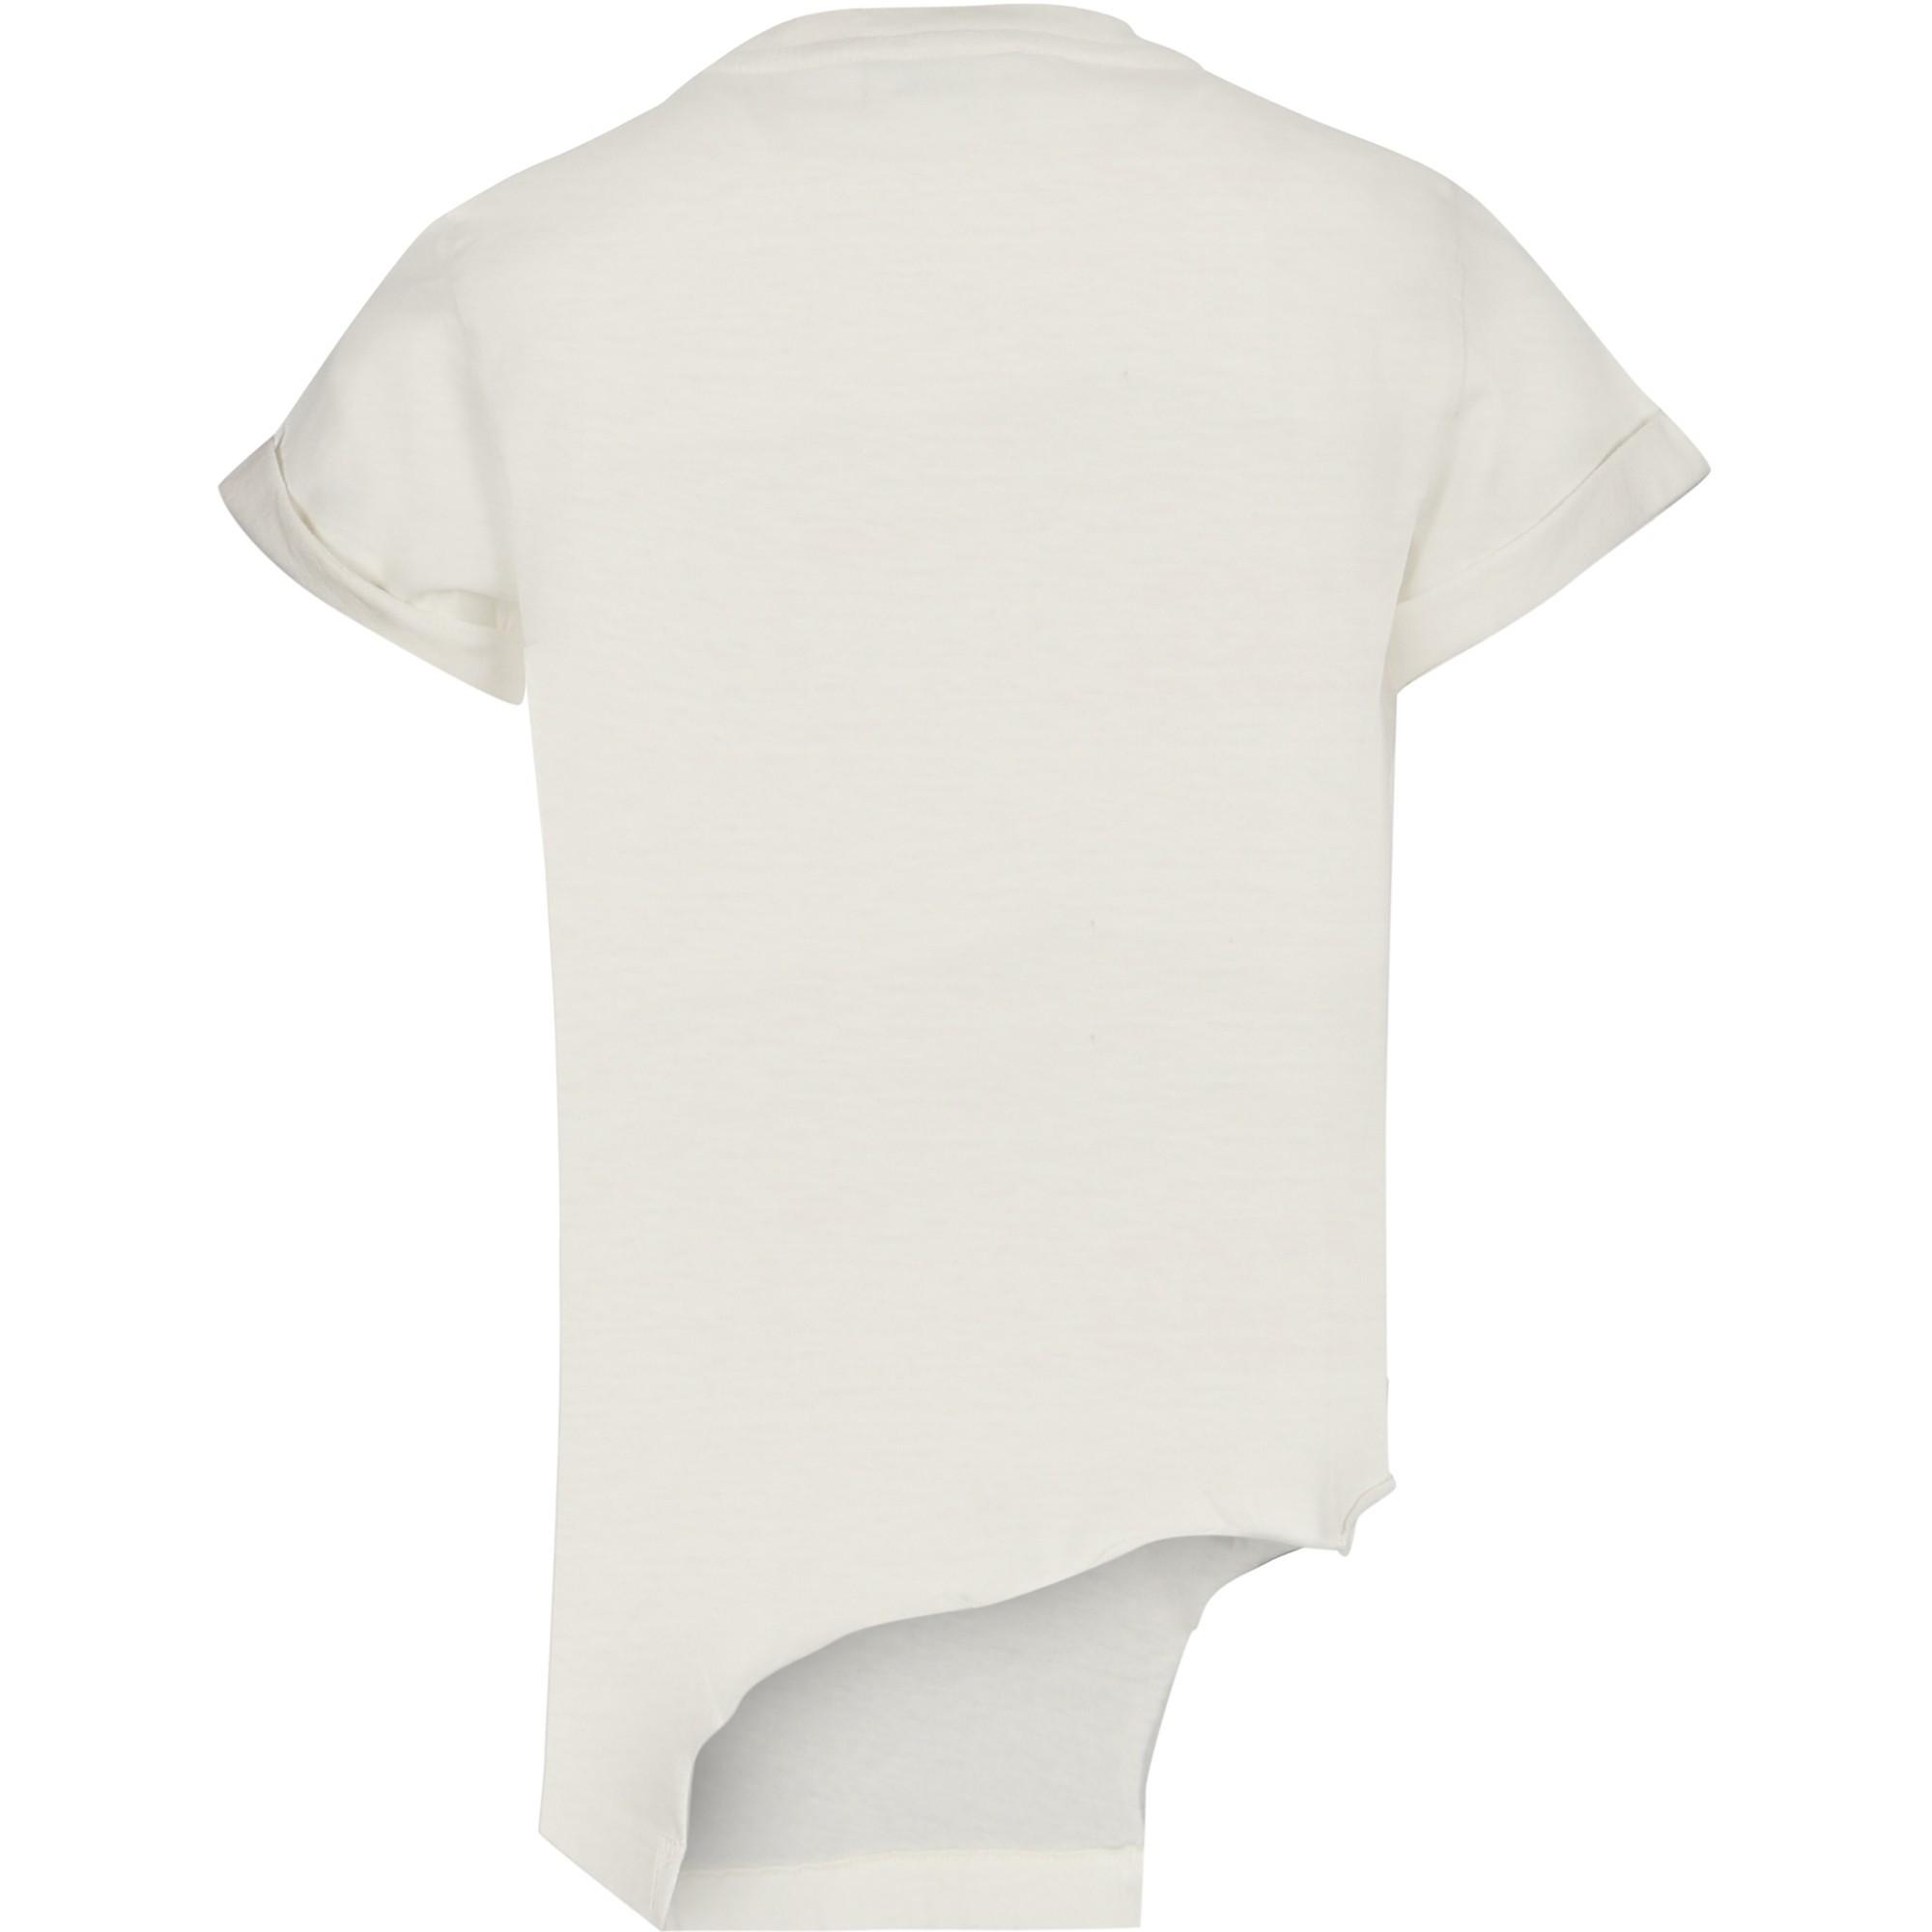 Mens Hoodie Qatar Ripped Effect Under Shirt